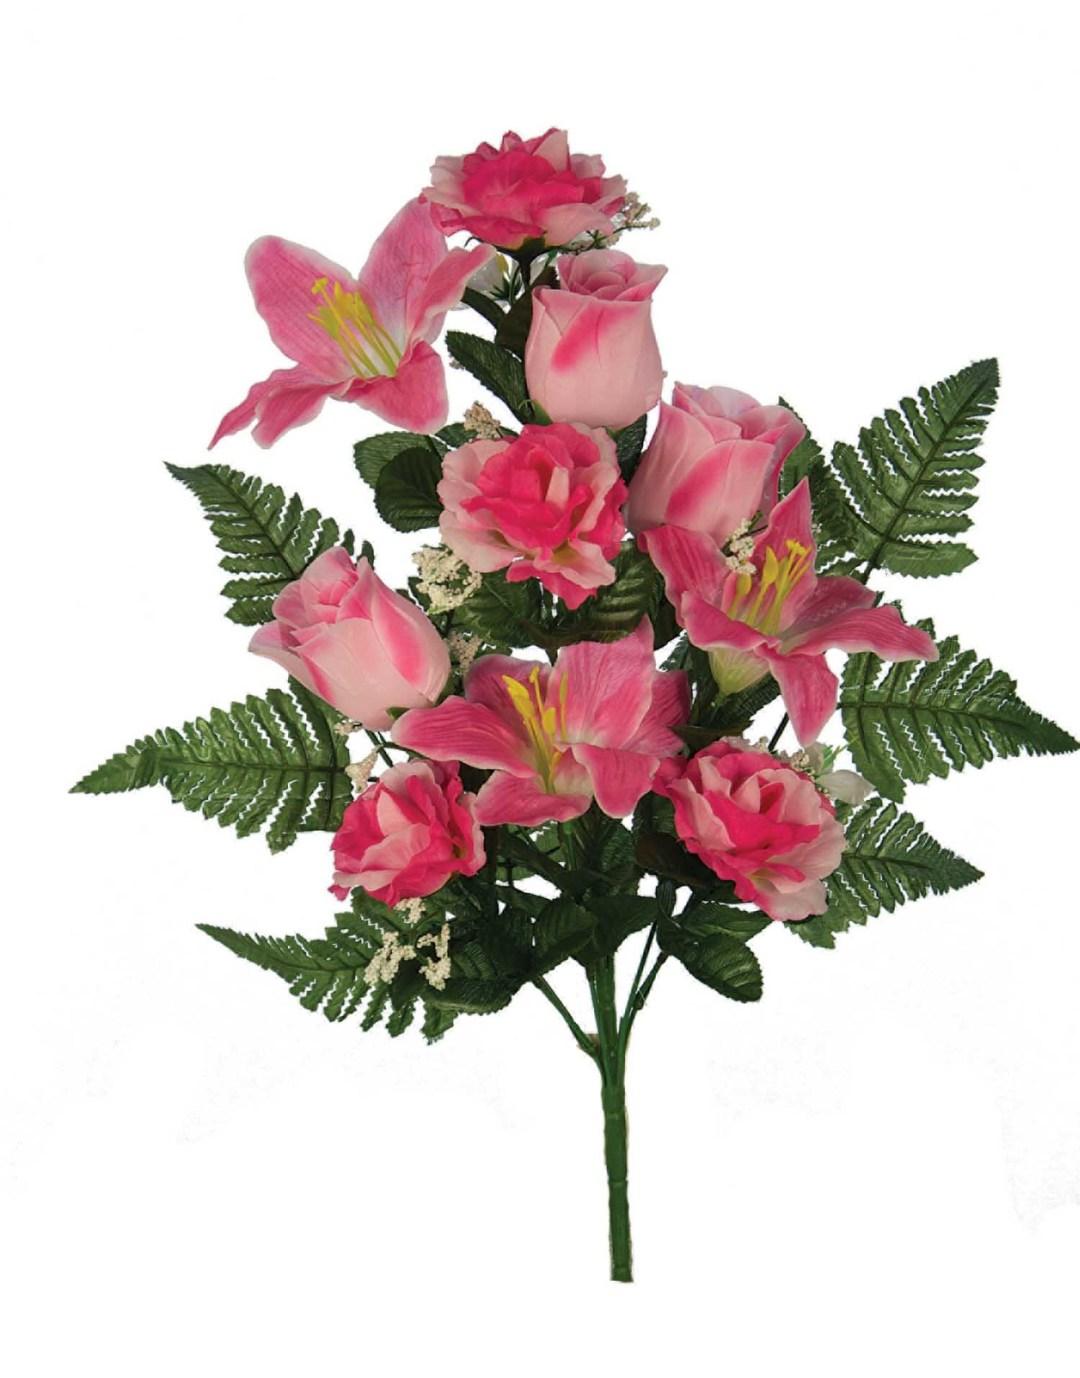 "SB3001PNK - 18"" One Sided Lily / Rose Mix x12 $3.95 each SB3001PNK"